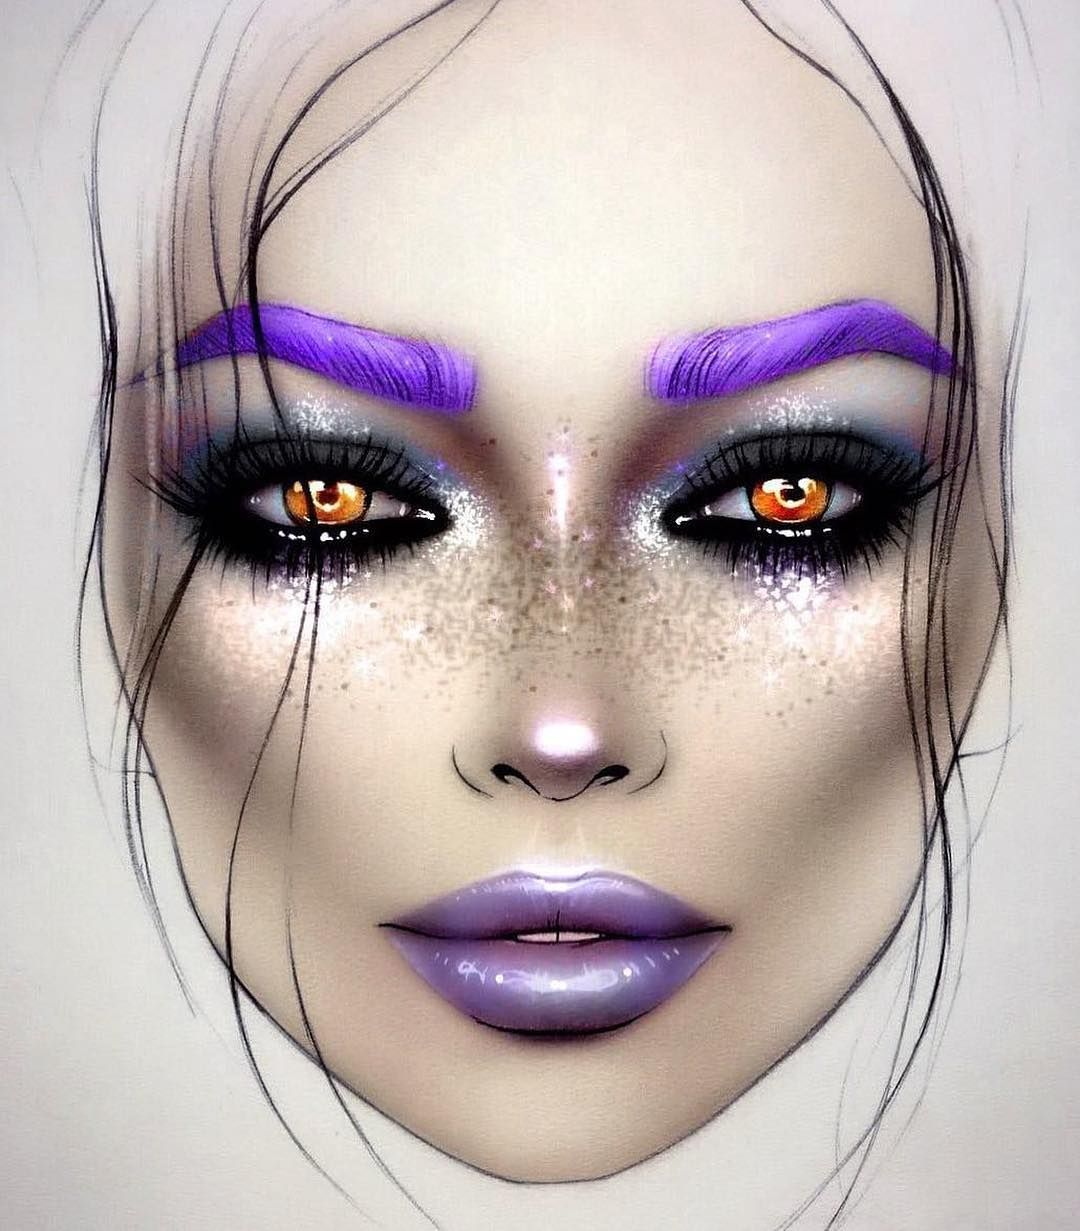 Makeup Club - Paula Waśkiewicz - Posty | Facebook